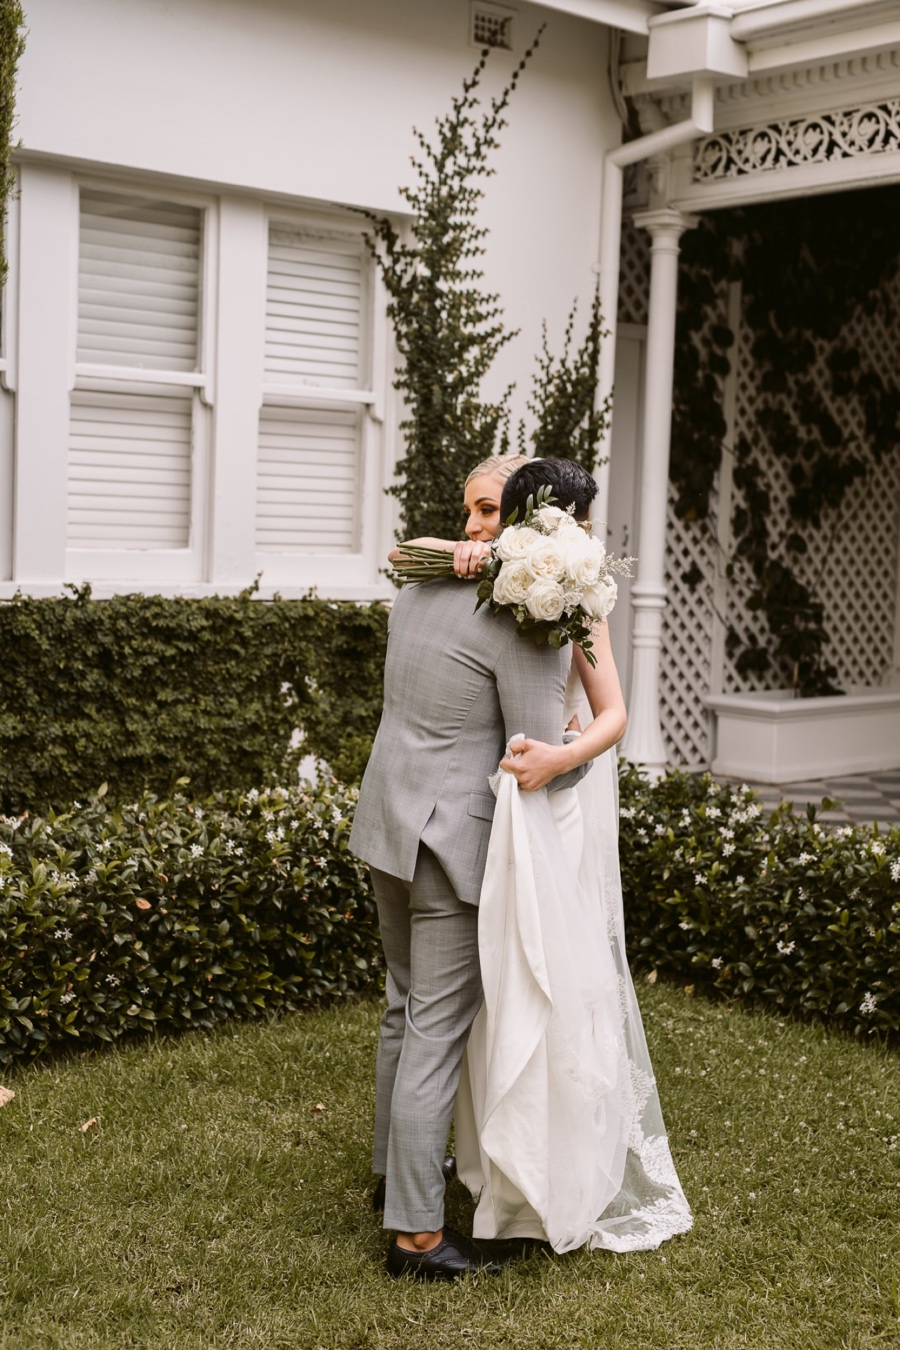 Quat Quatta Melbourne Wedding Photography69.jpg